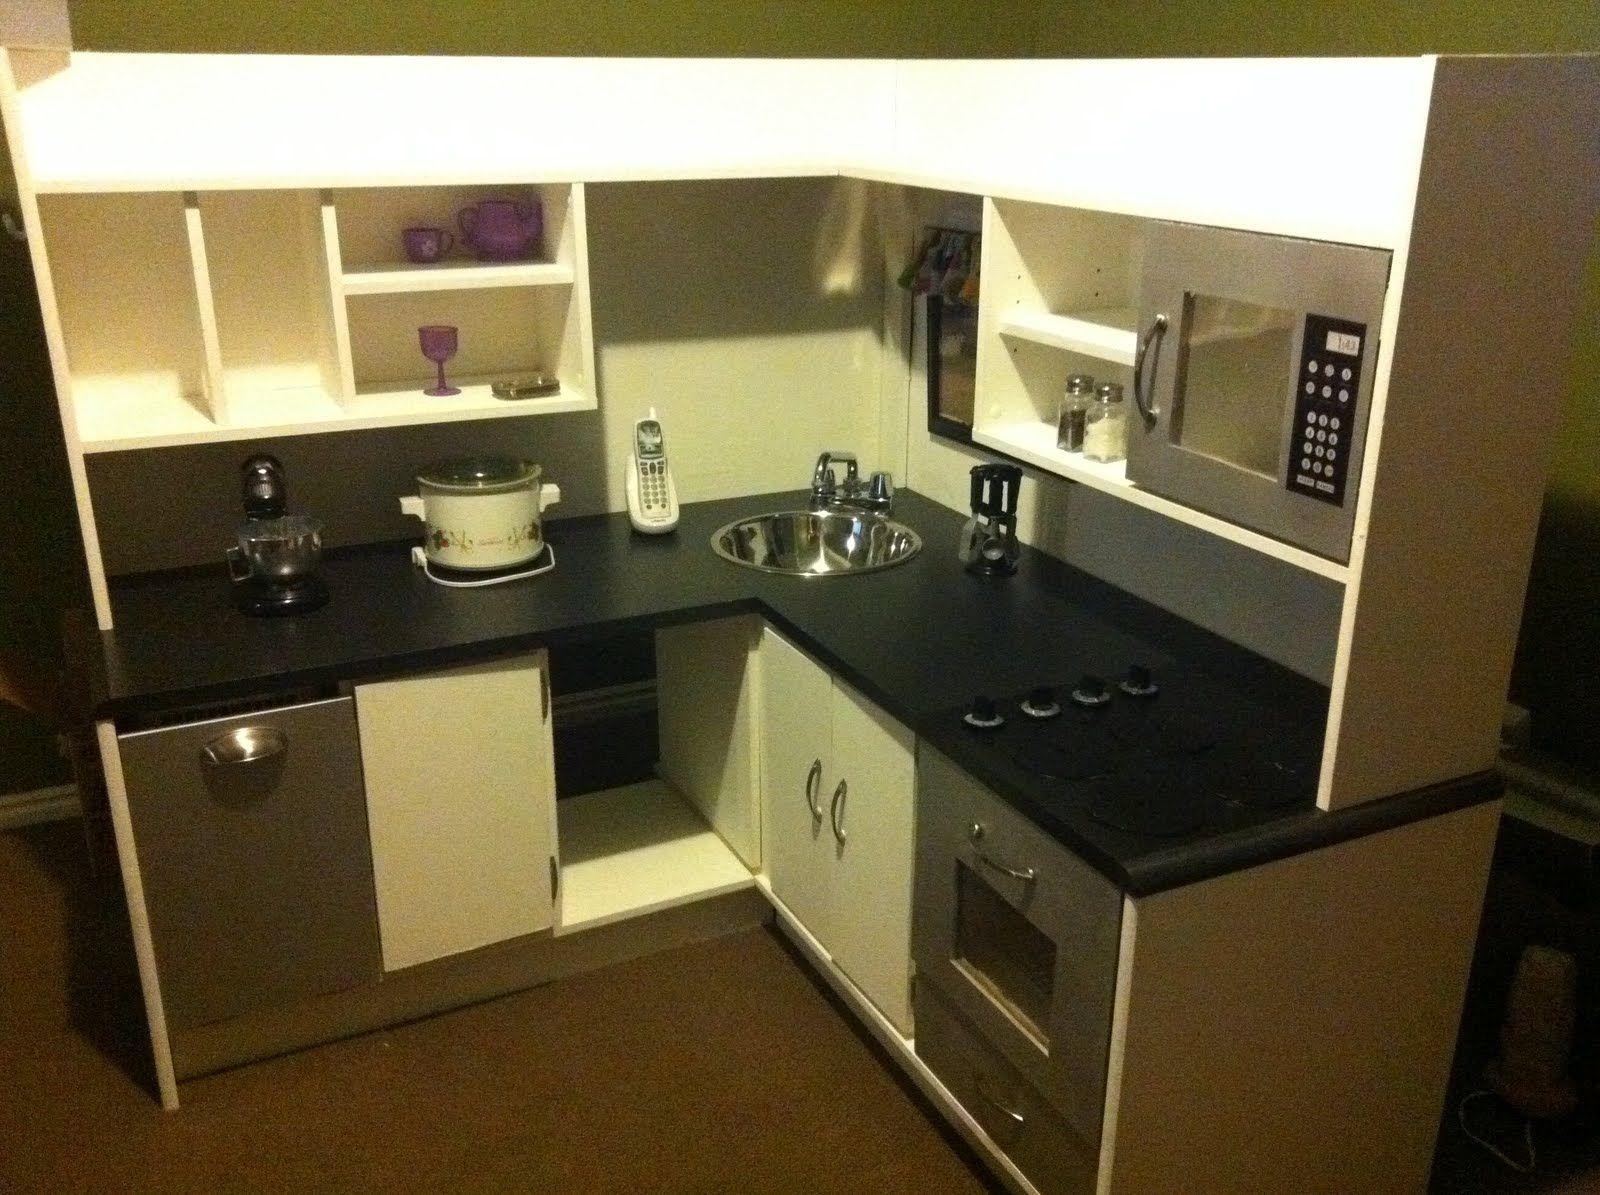 Diy Play Kitchen From Corner Desk Tutorials For Sink Dishwasher Microwave